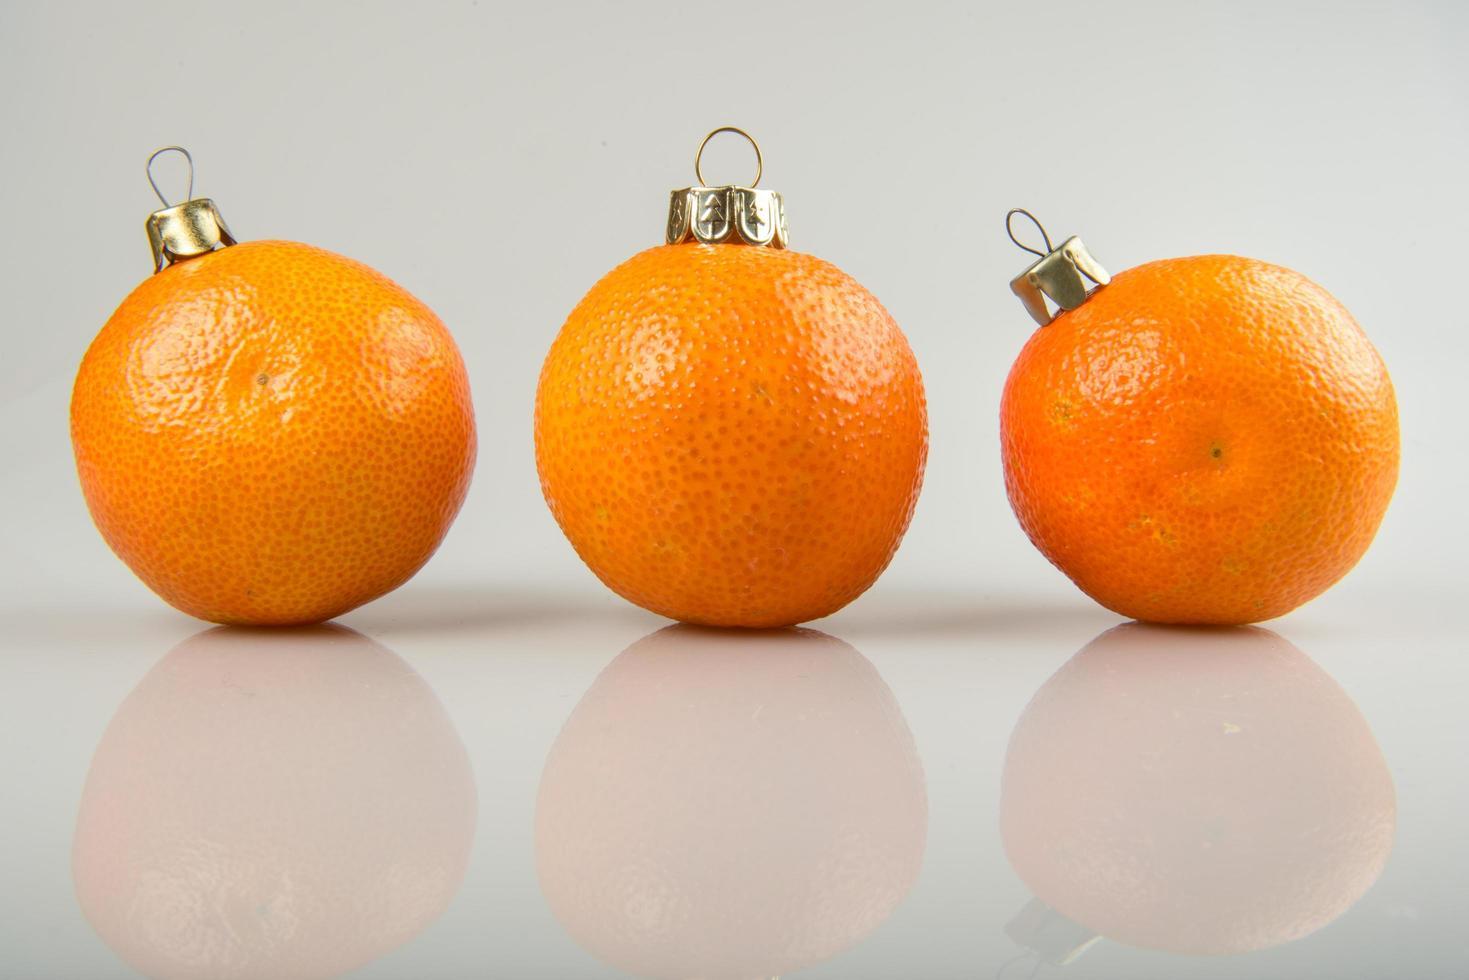 tre tangerinstruntsaker foto